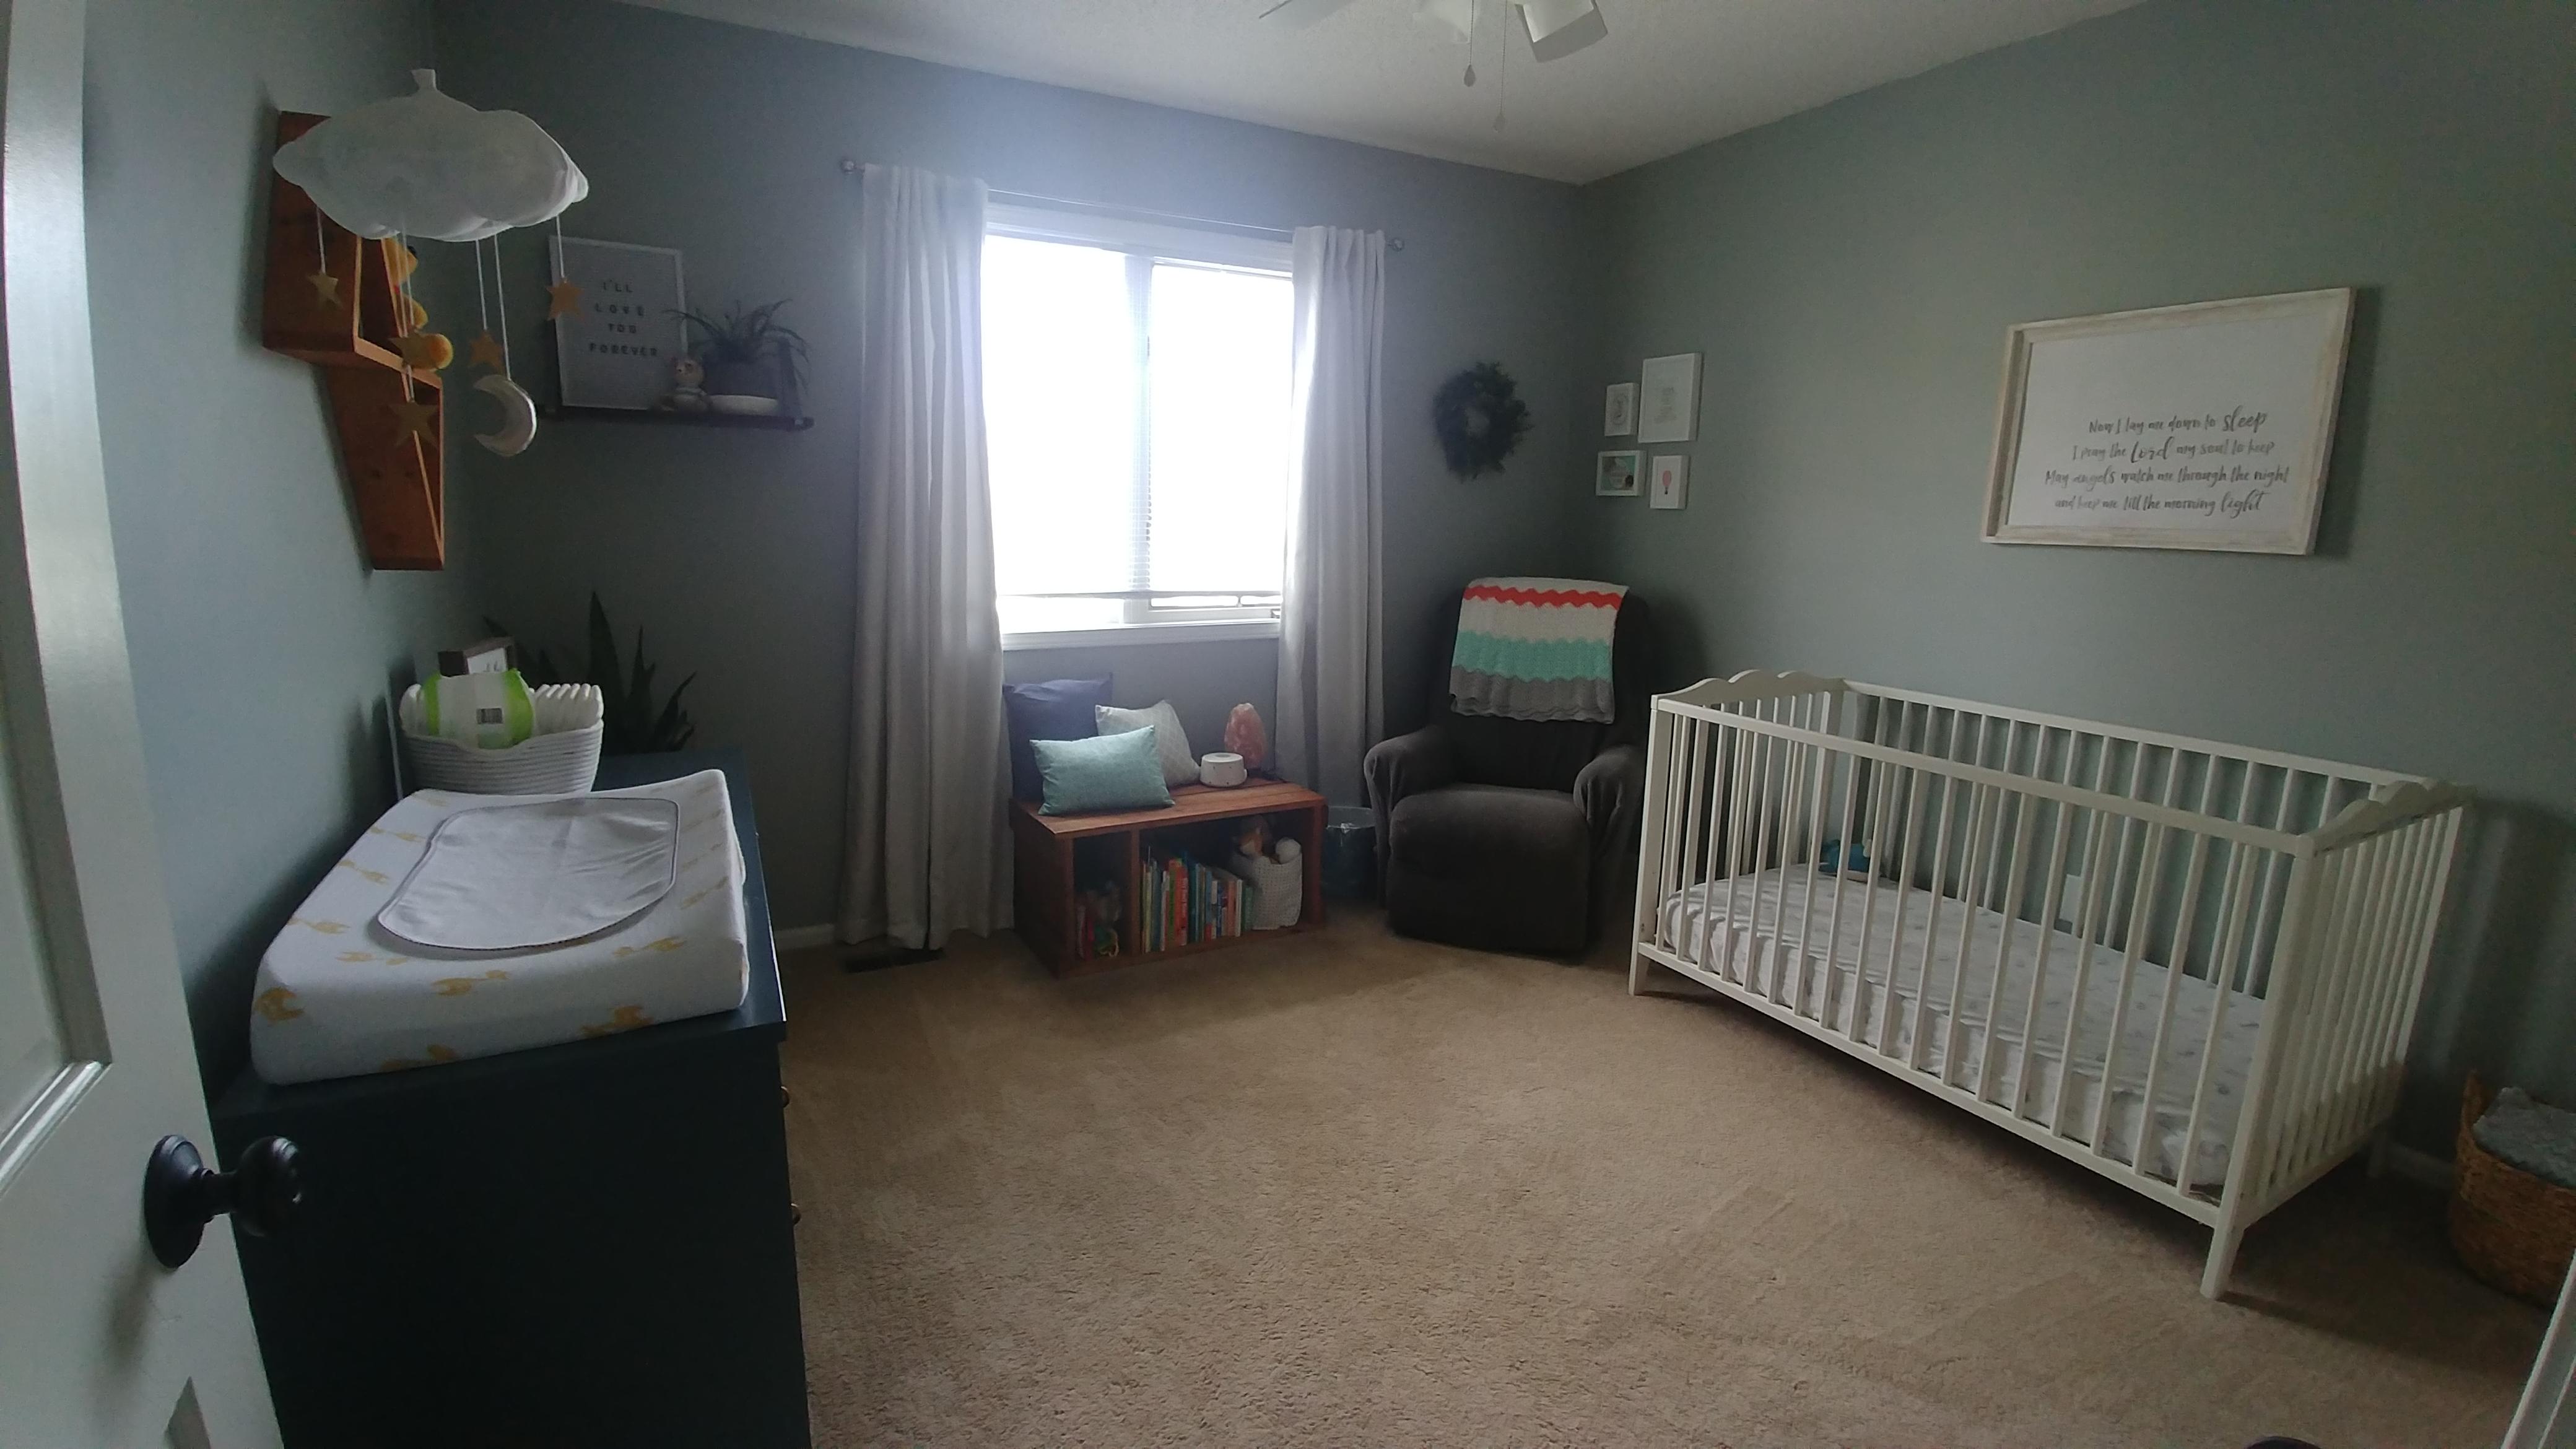 Nursery After